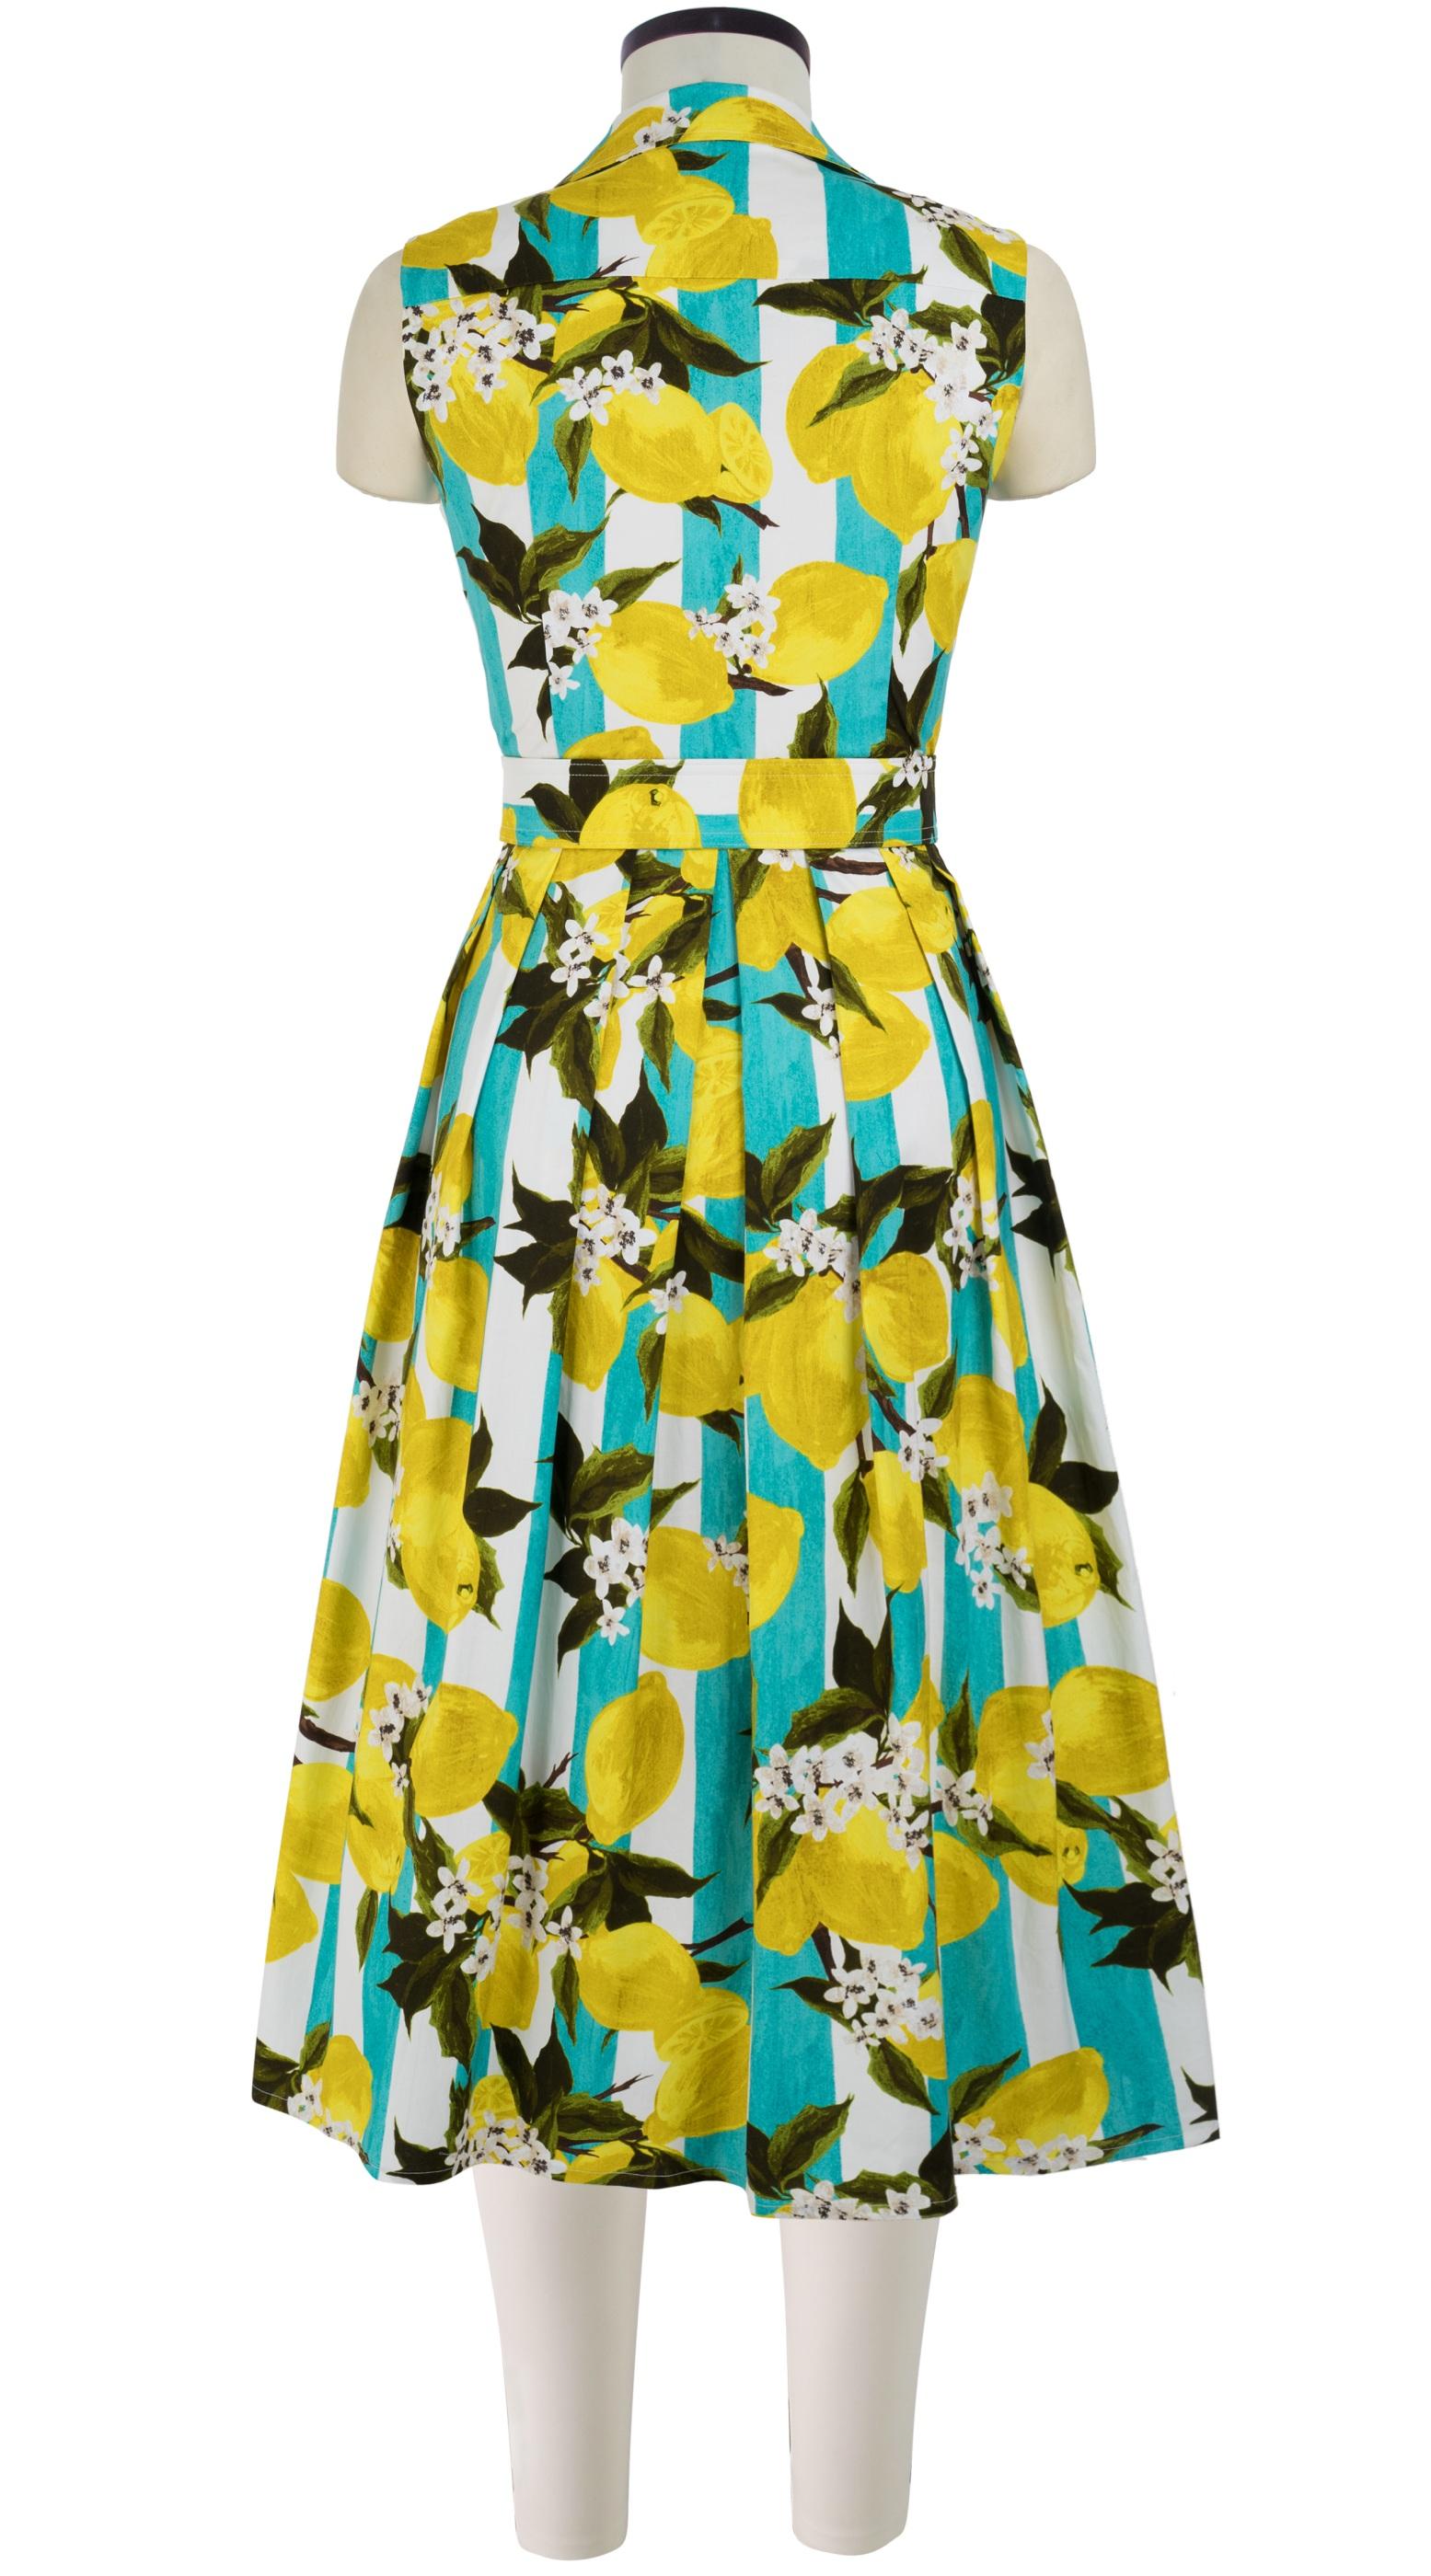 Lemon Stripe_Aqua Yellow_Audrey Dress #1 Shirt Collar Sleeveless_Midi_CS_Back-1